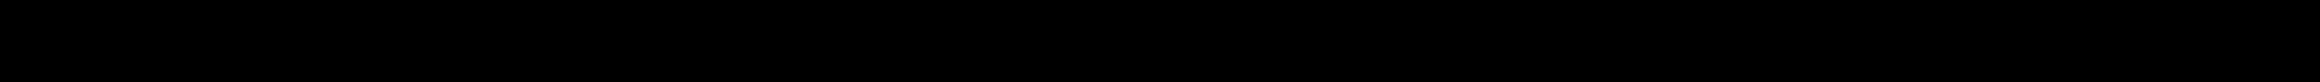 SKF 11 51 0 032 679, 11 51 2 243 003, 11 51 2 244 333, 11 51 2 245 687, 11 51 9 068 606 Wasserpumpe